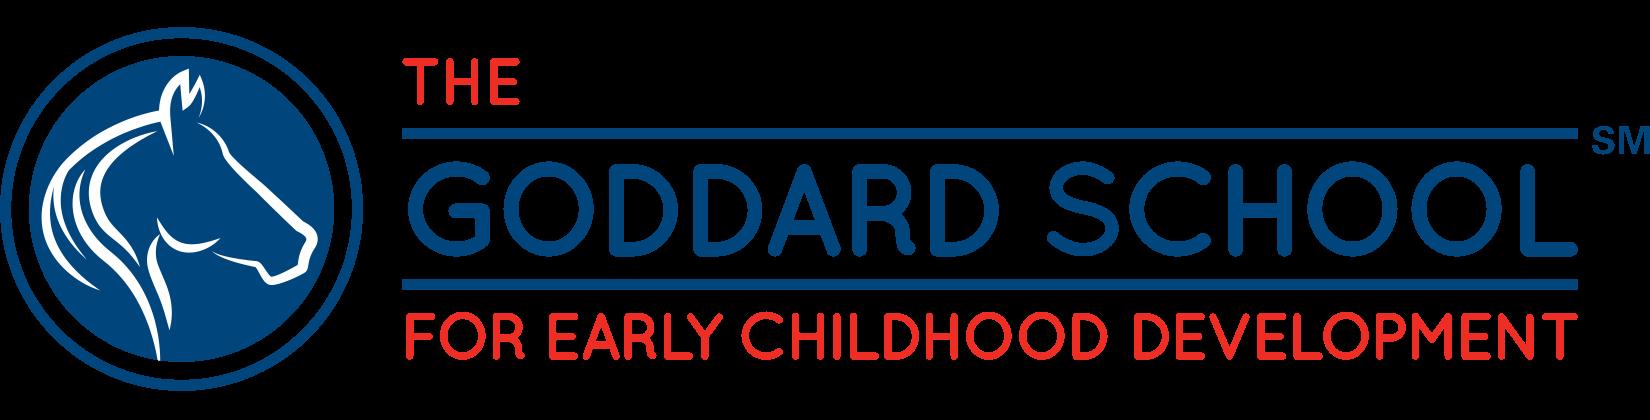 The Goddard School (North Indianapolis) logo